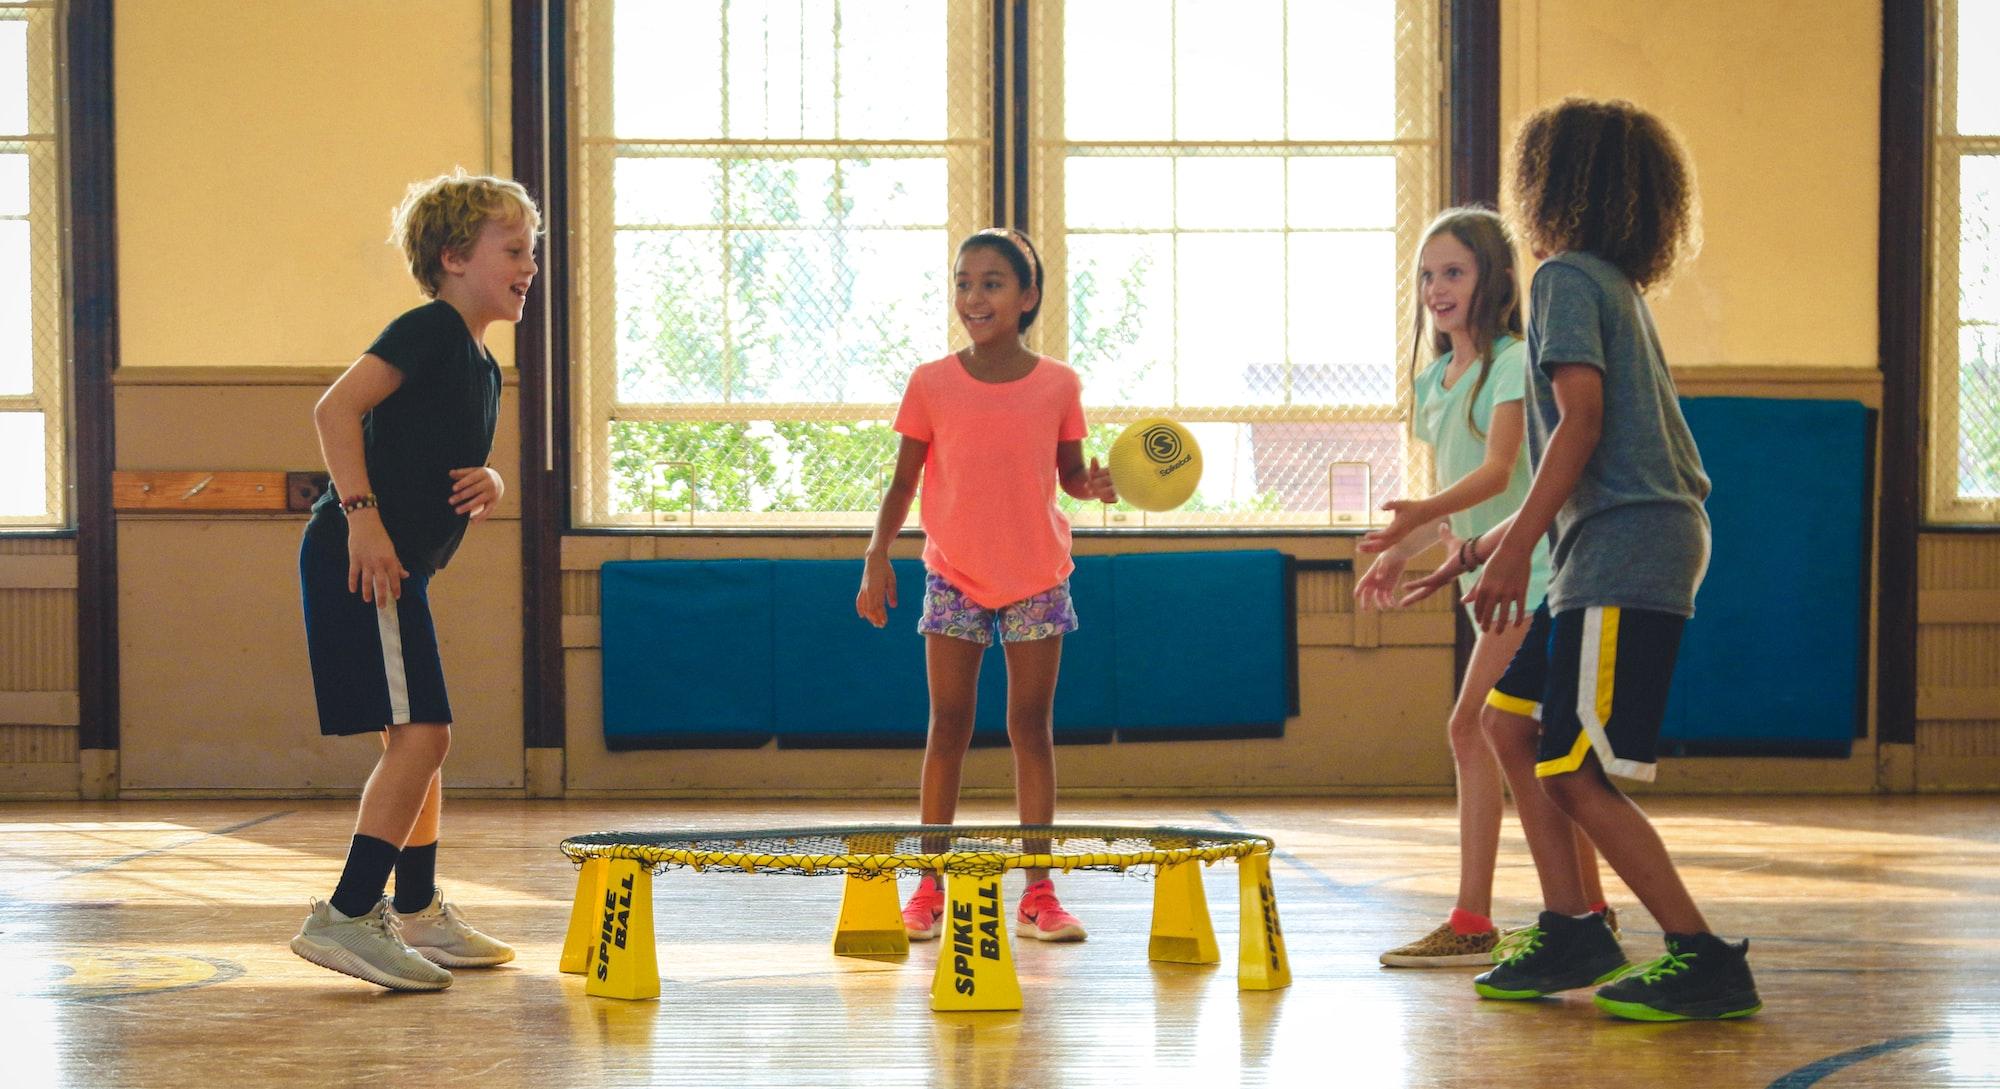 Kids playing Spikeball on a Spikeball Rookie Kit